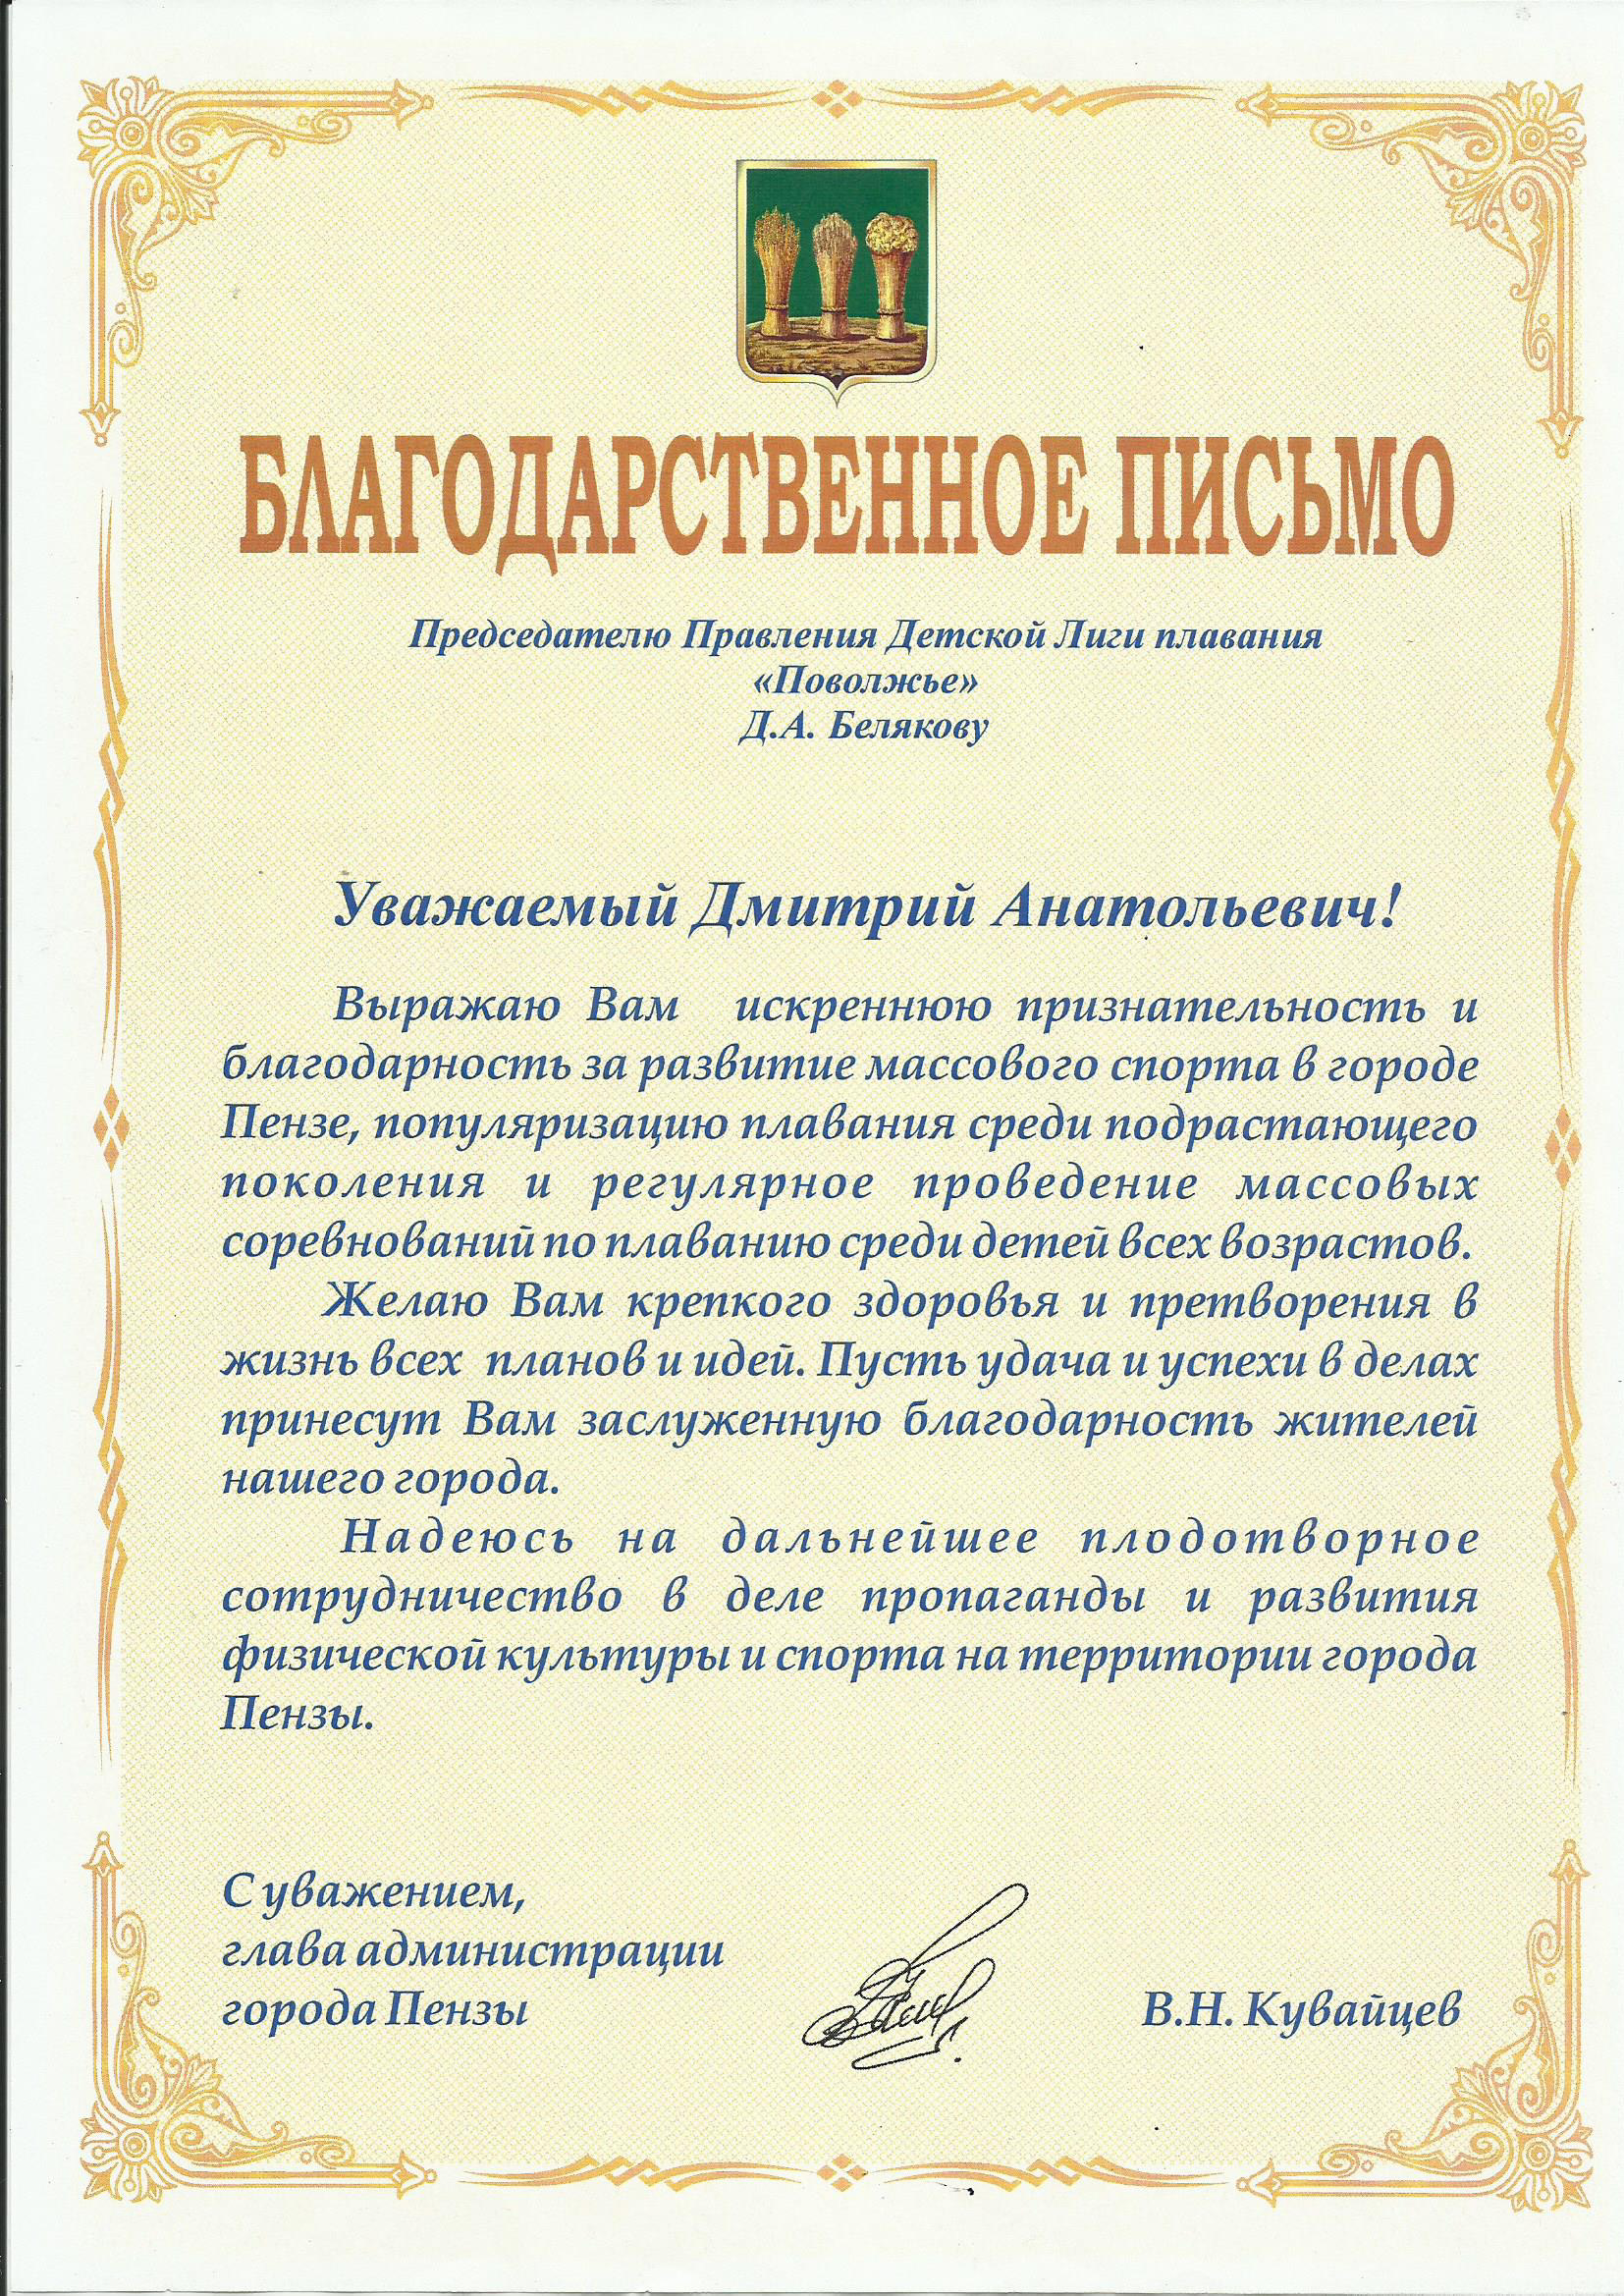 https://dlpp.ru/wp-content/uploads/2019/11/диплом-2-1.jpg